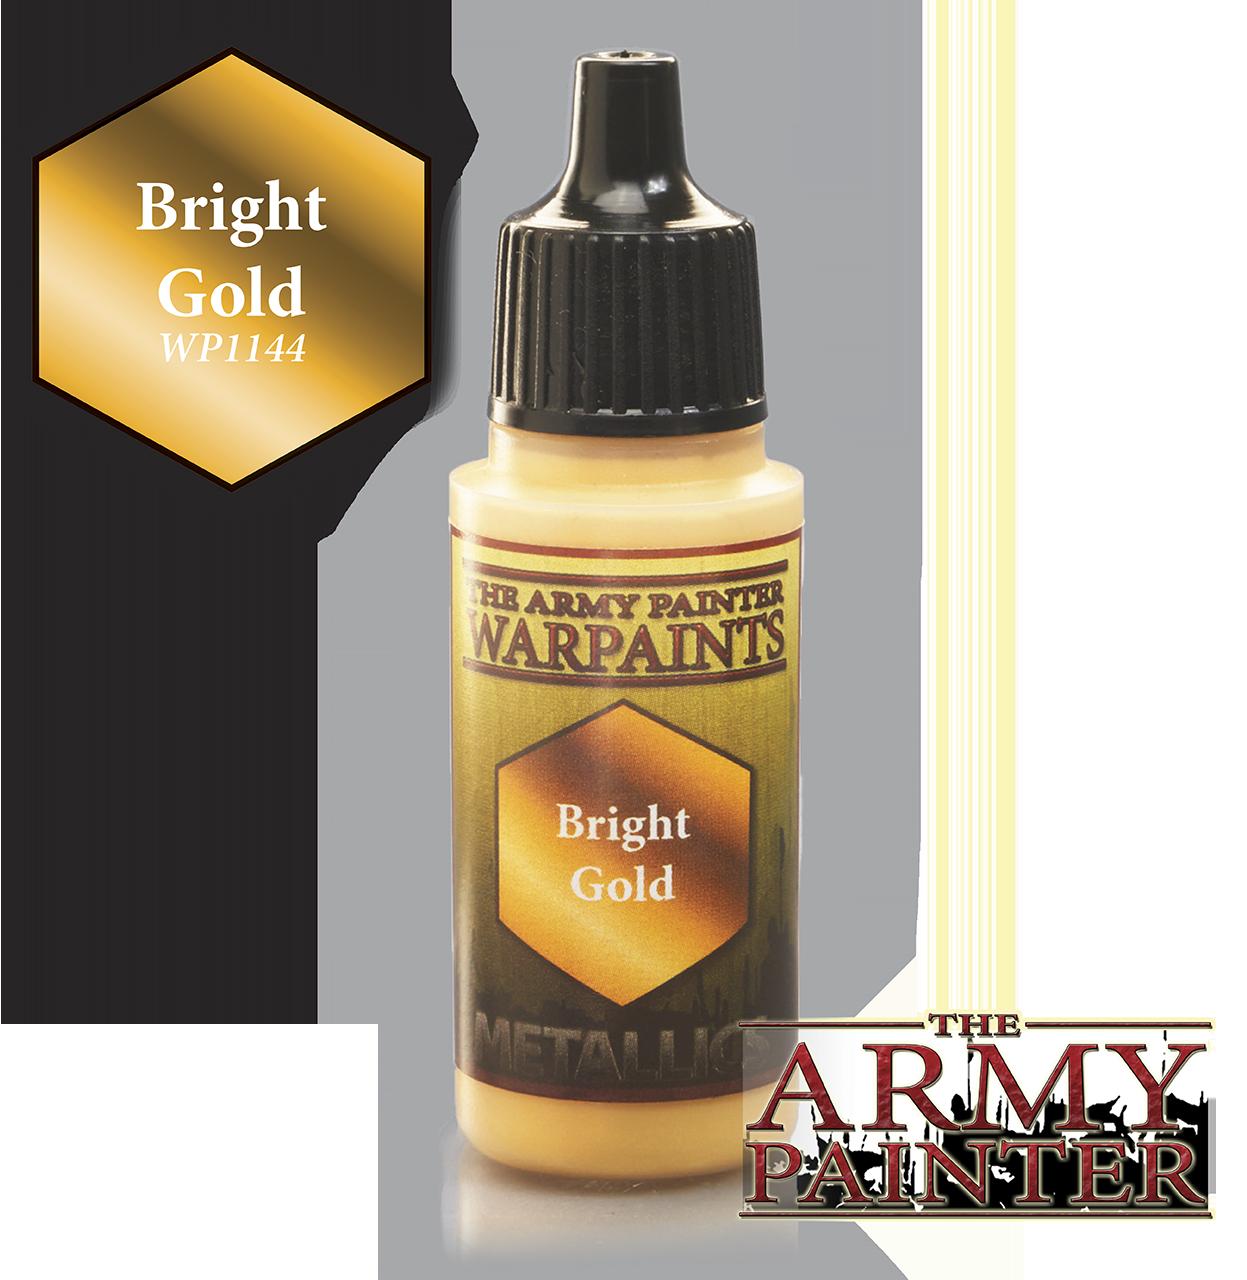 Bright Gold - Army Painter Warpaints